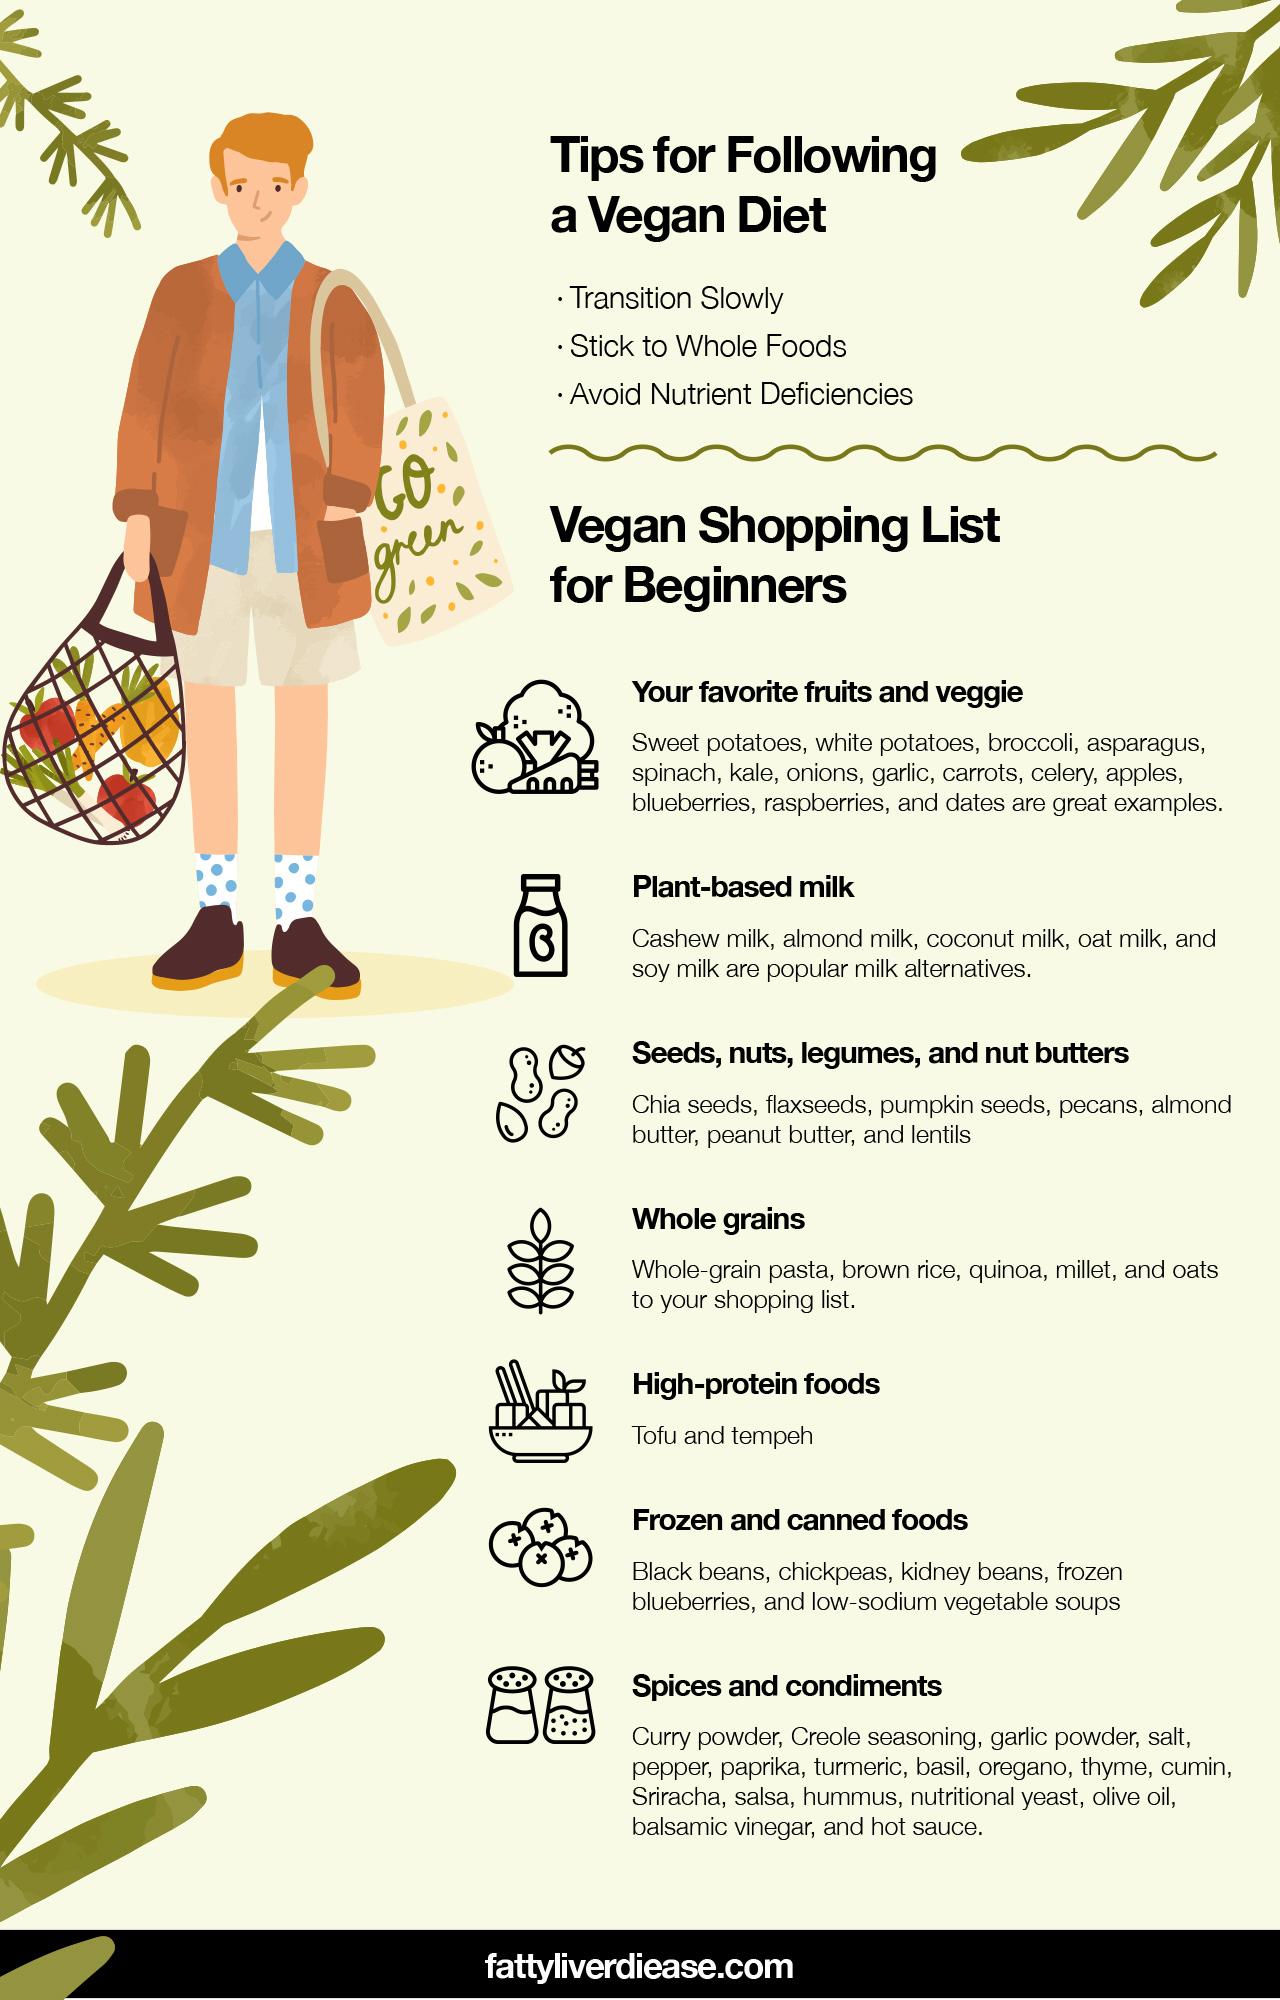 How to Go Vegan for Beginners